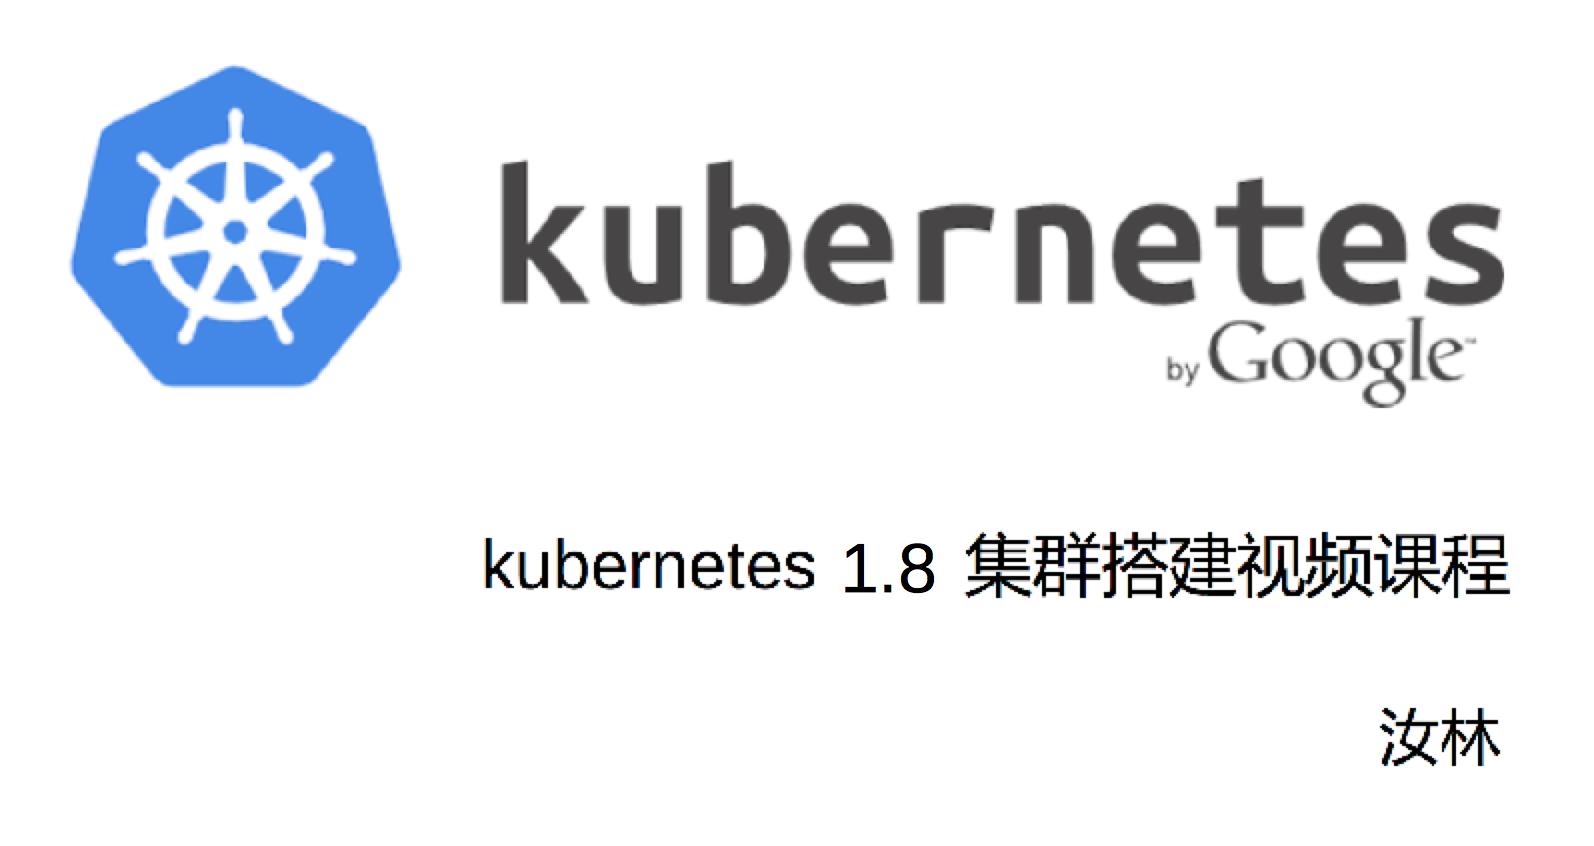 kubernetes 1.8 基于TLS认证的集群搭建与使用讲解视频课程